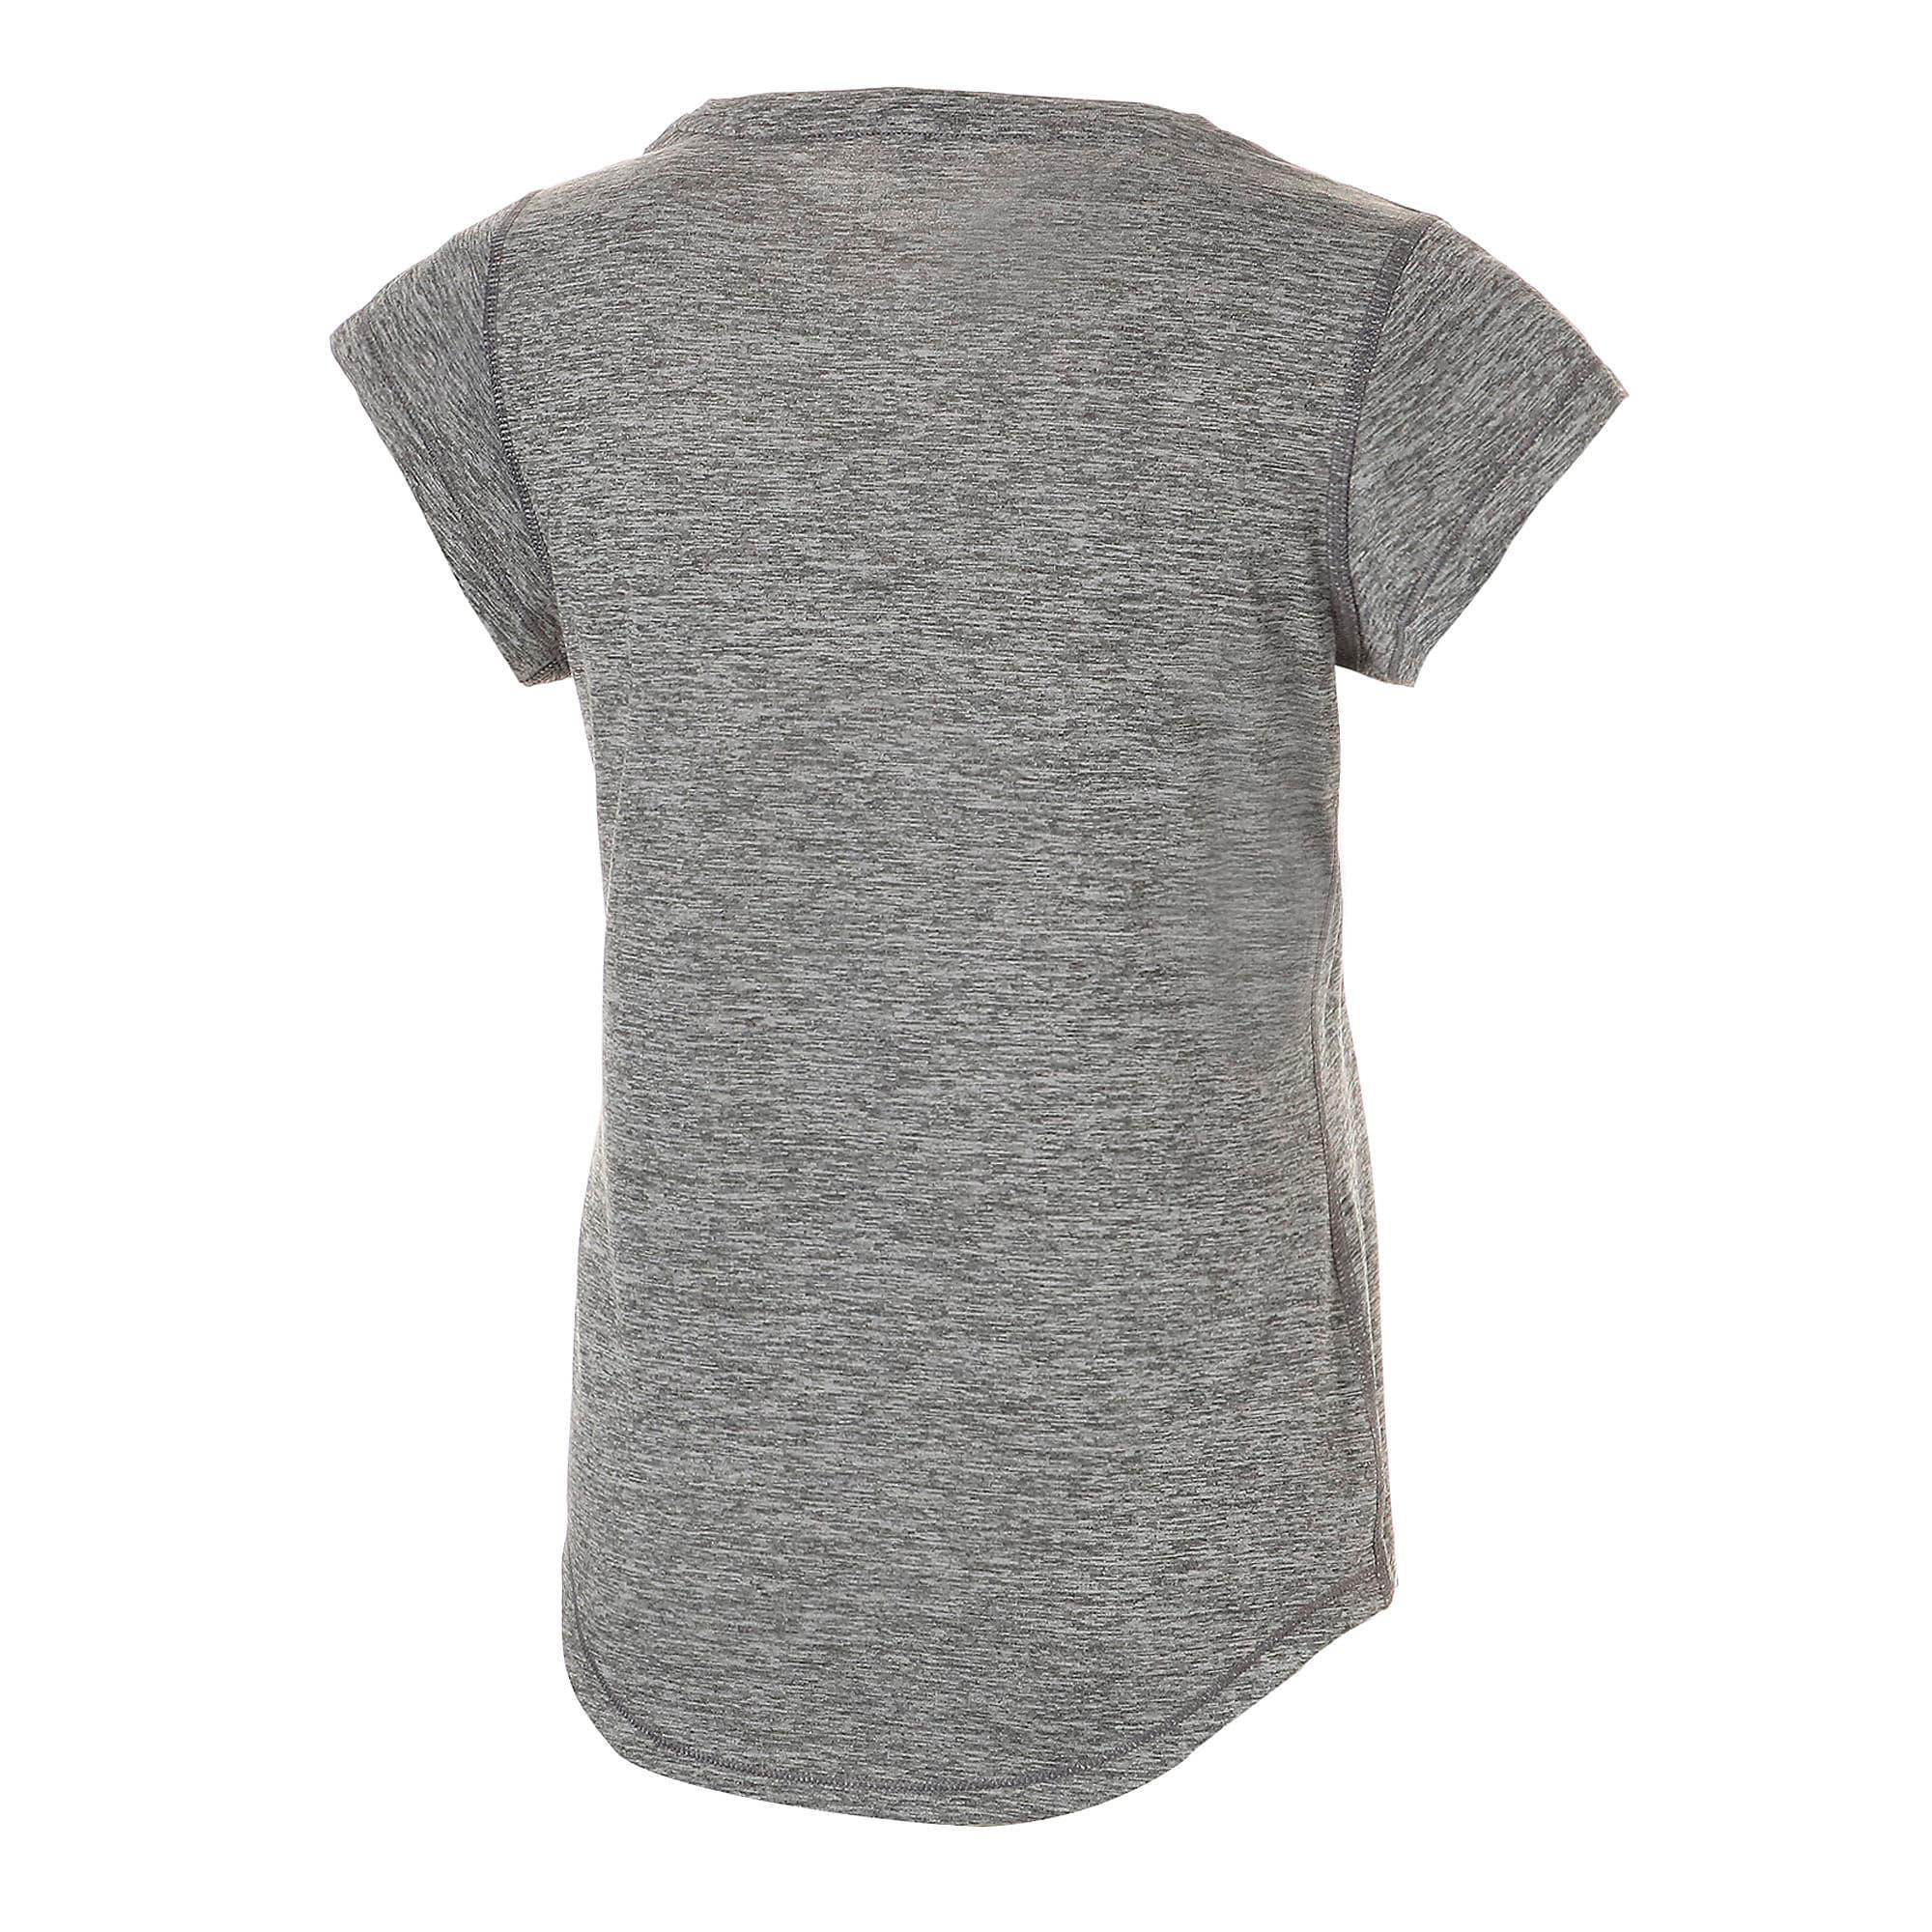 Thumbnail 6 of ヘザー キャット ウィメンズ ランニング Tシャツ 半袖, Medium Gray Heather, medium-JPN